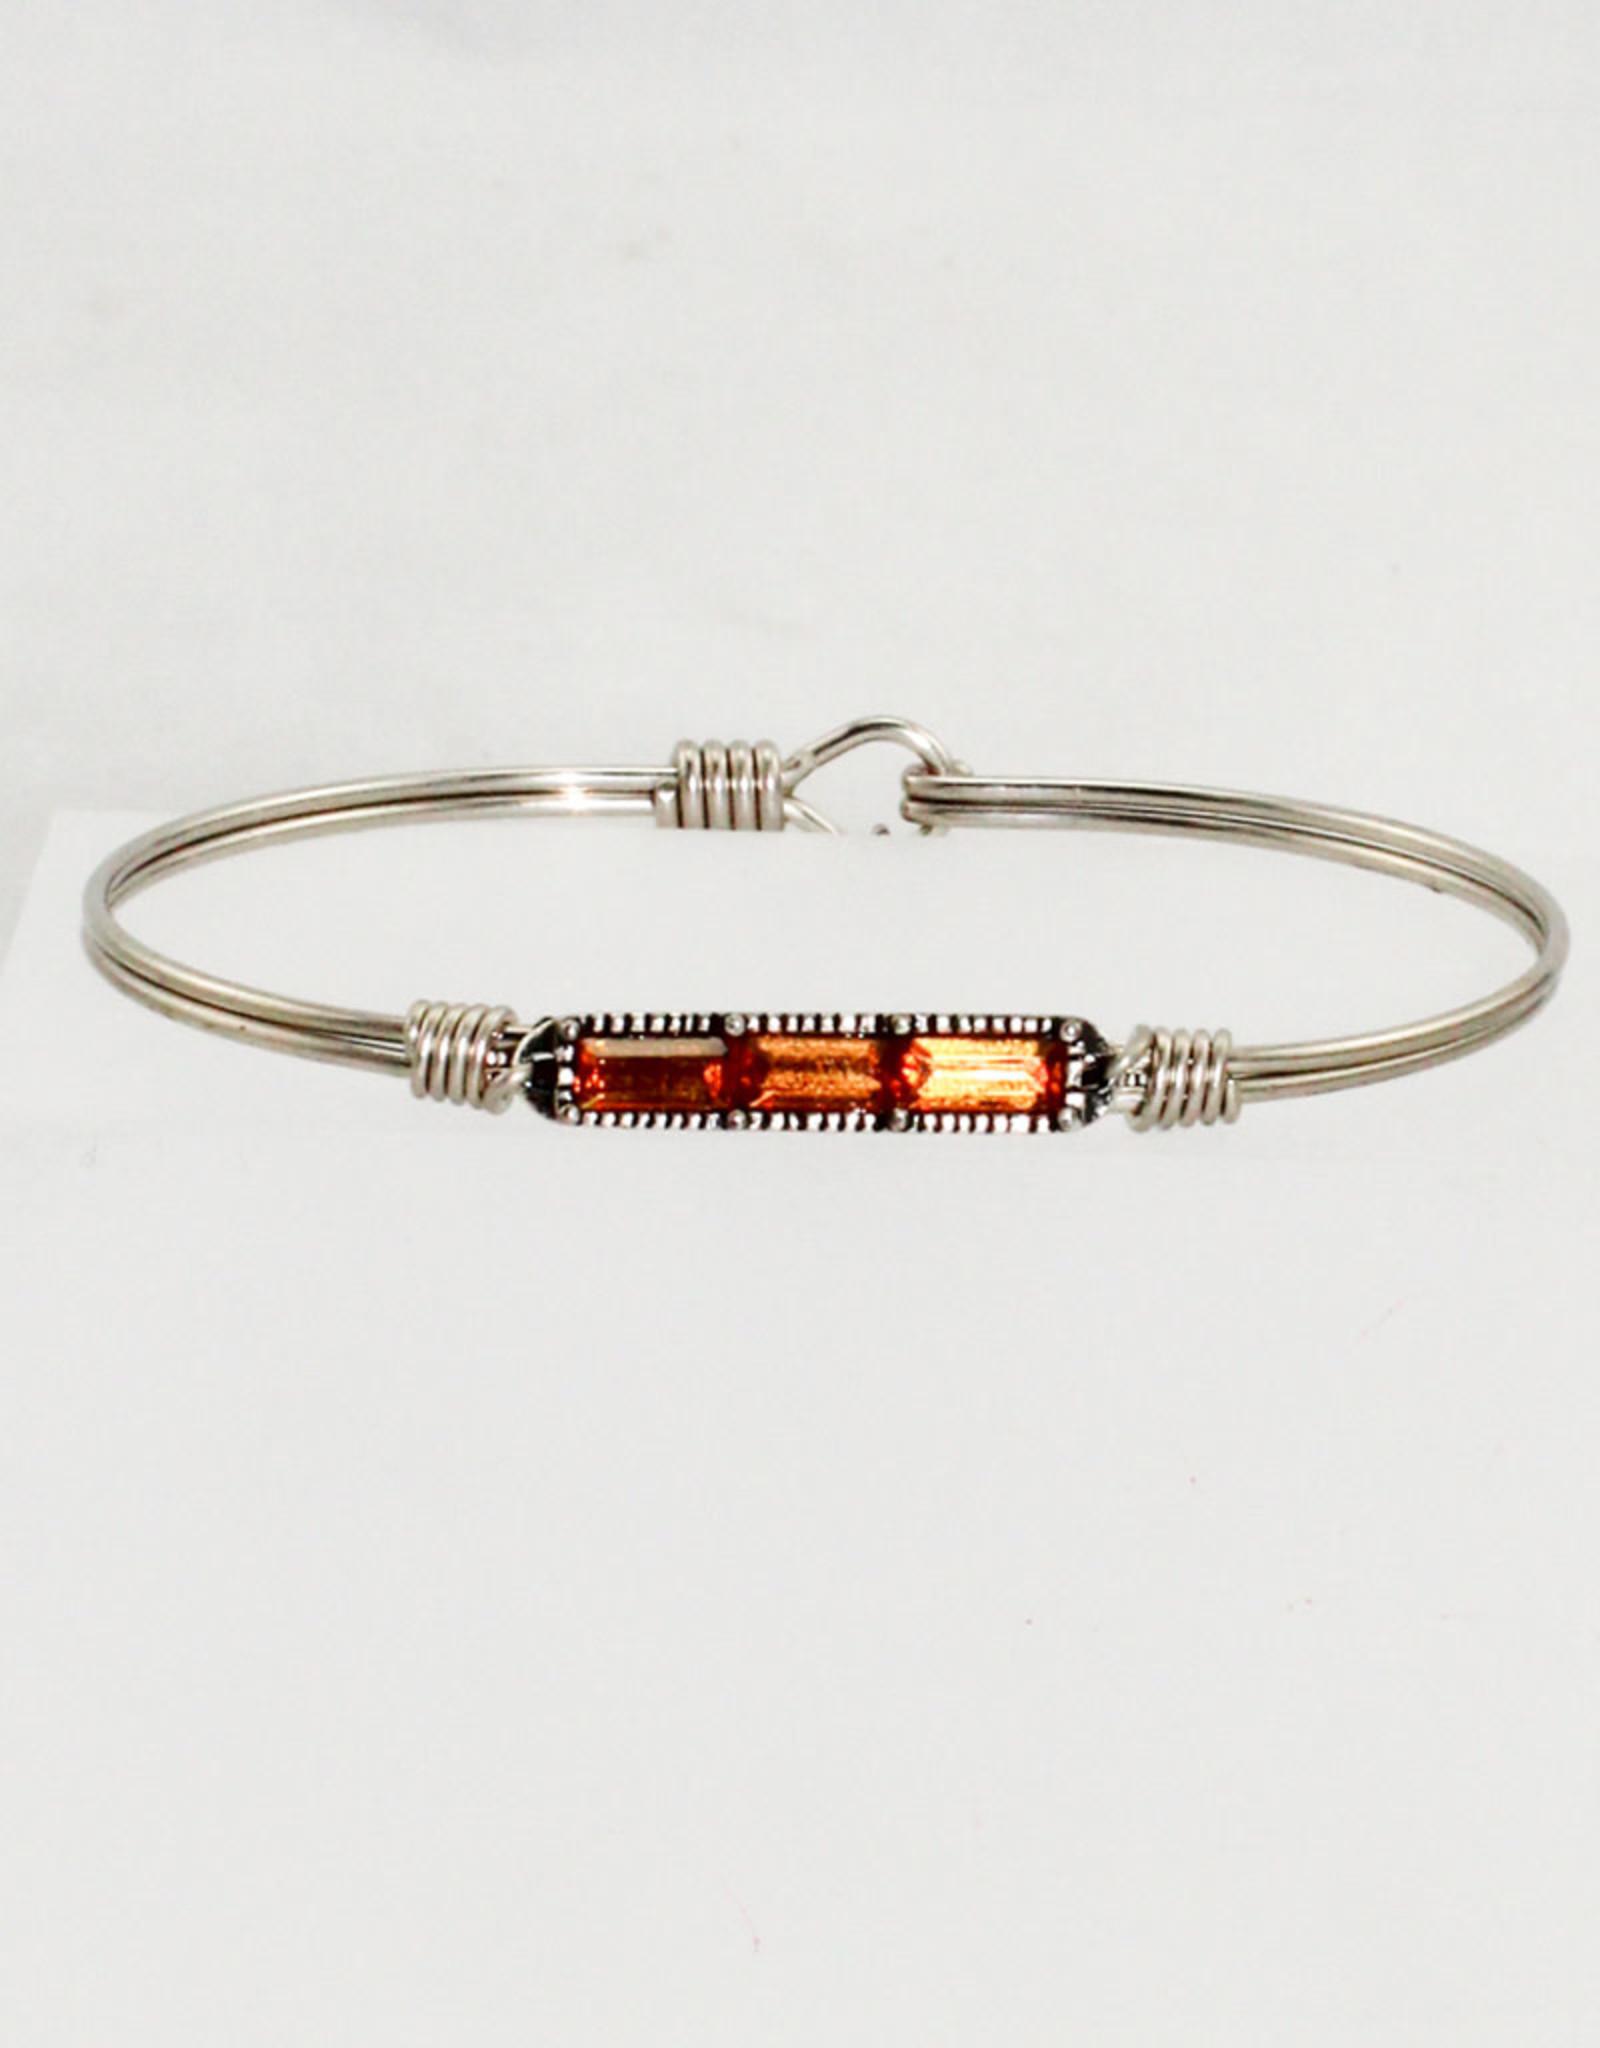 Luca + Danni Mini Hudson Bracelet in Autumn-Regular size